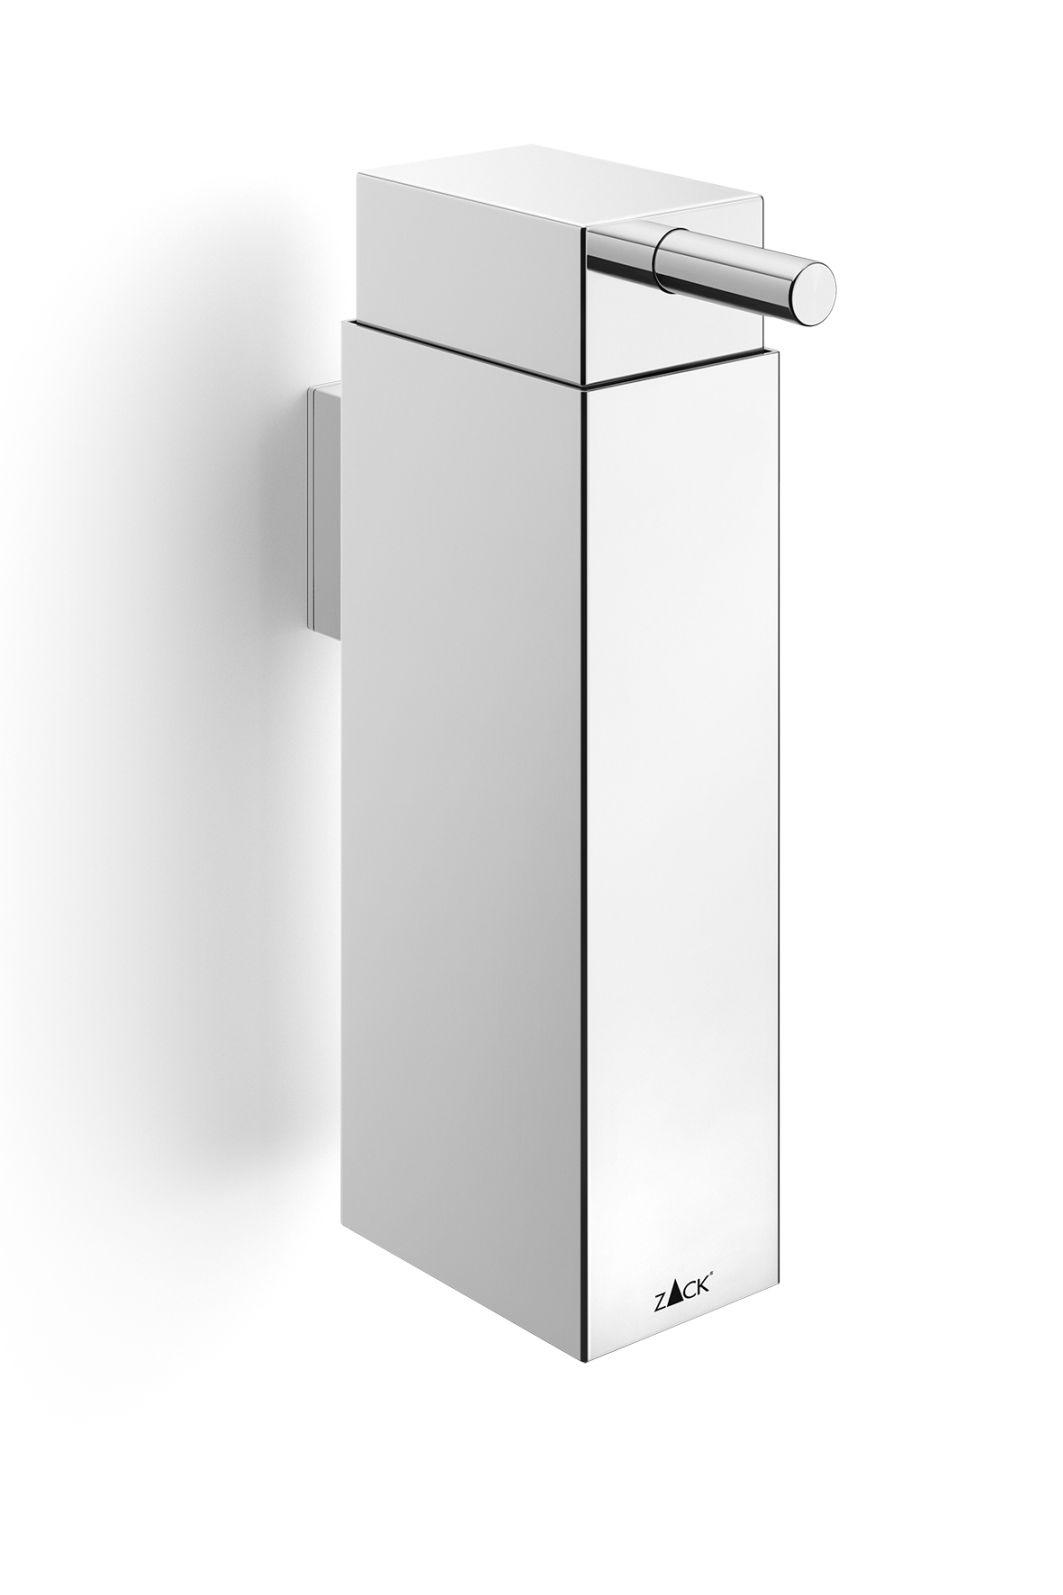 Dávkovač na mýdlo LINEA 190 ml, nástěnný - ZACK